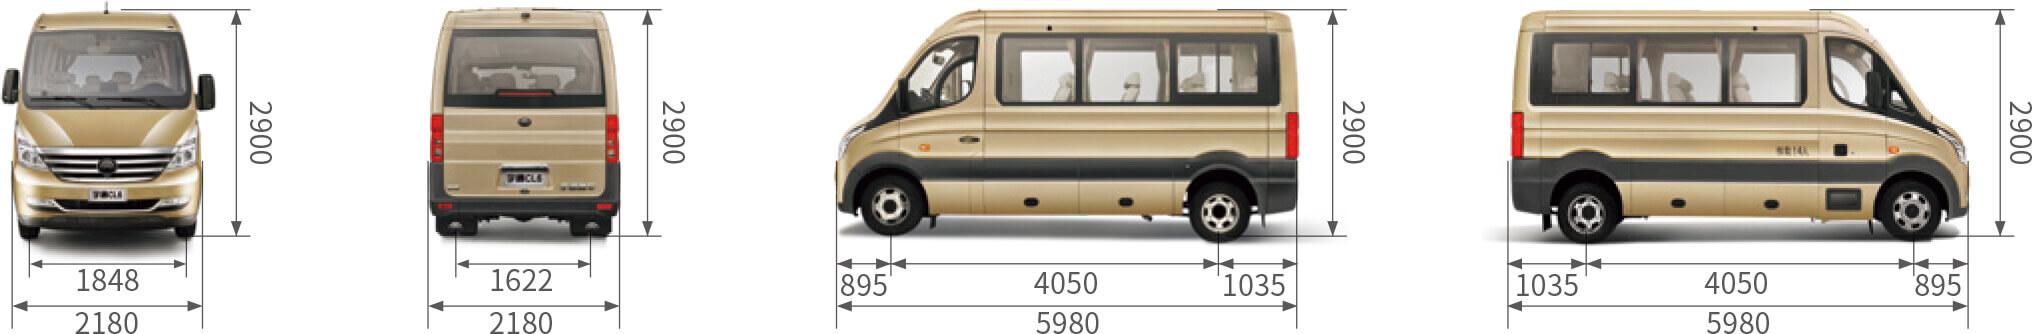 CL6新一代商旅客车